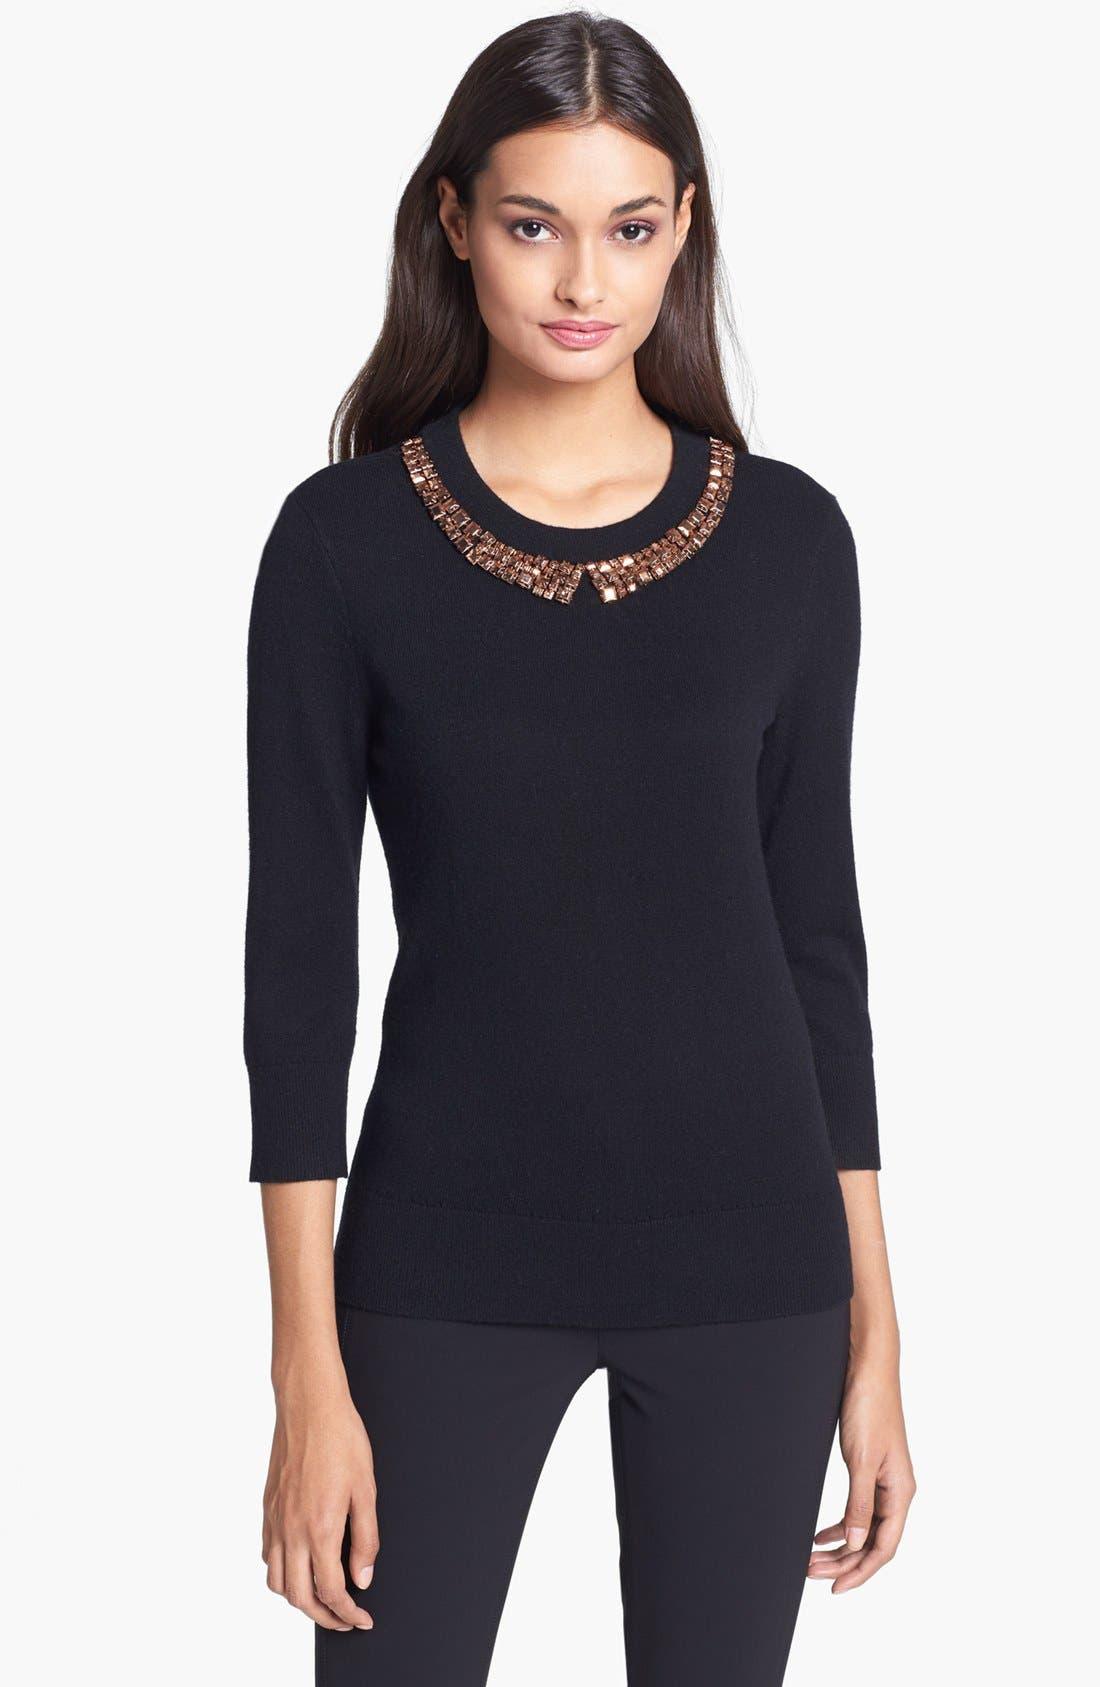 Alternate Image 1 Selected - kate spade new york 'avaline' embellished sweater